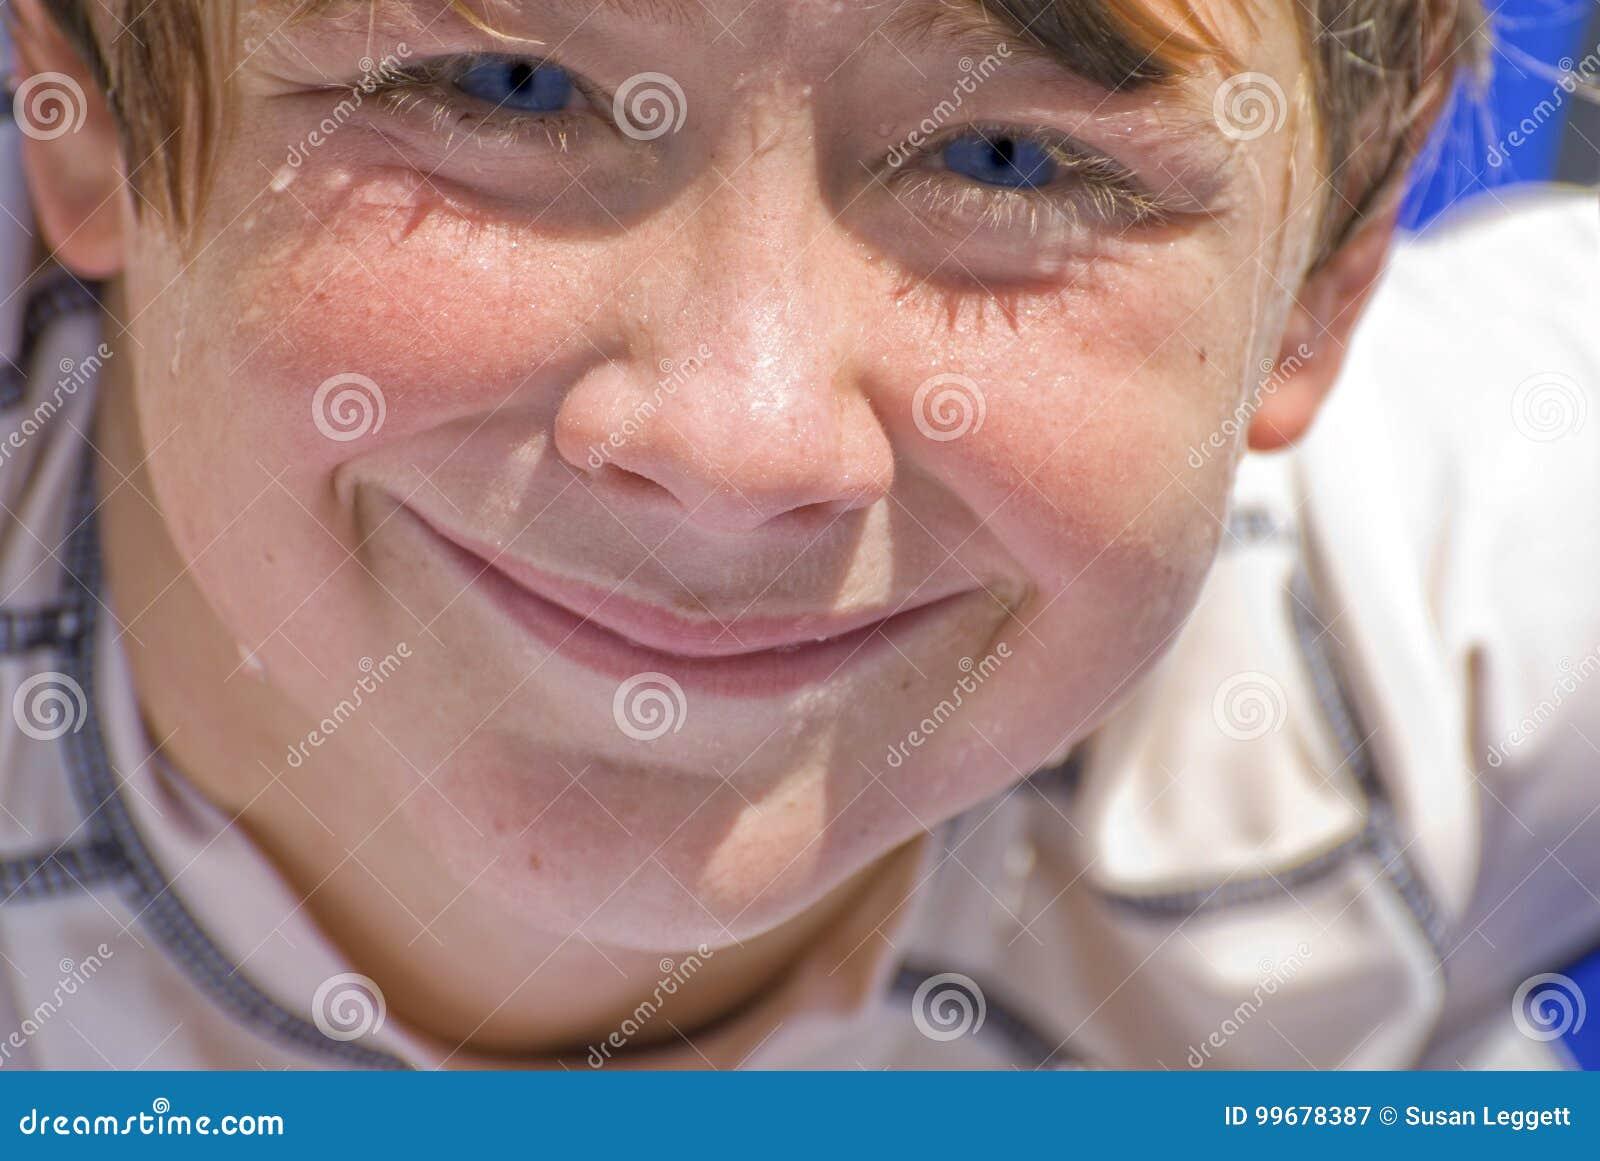 Smiling Wet Face Boy